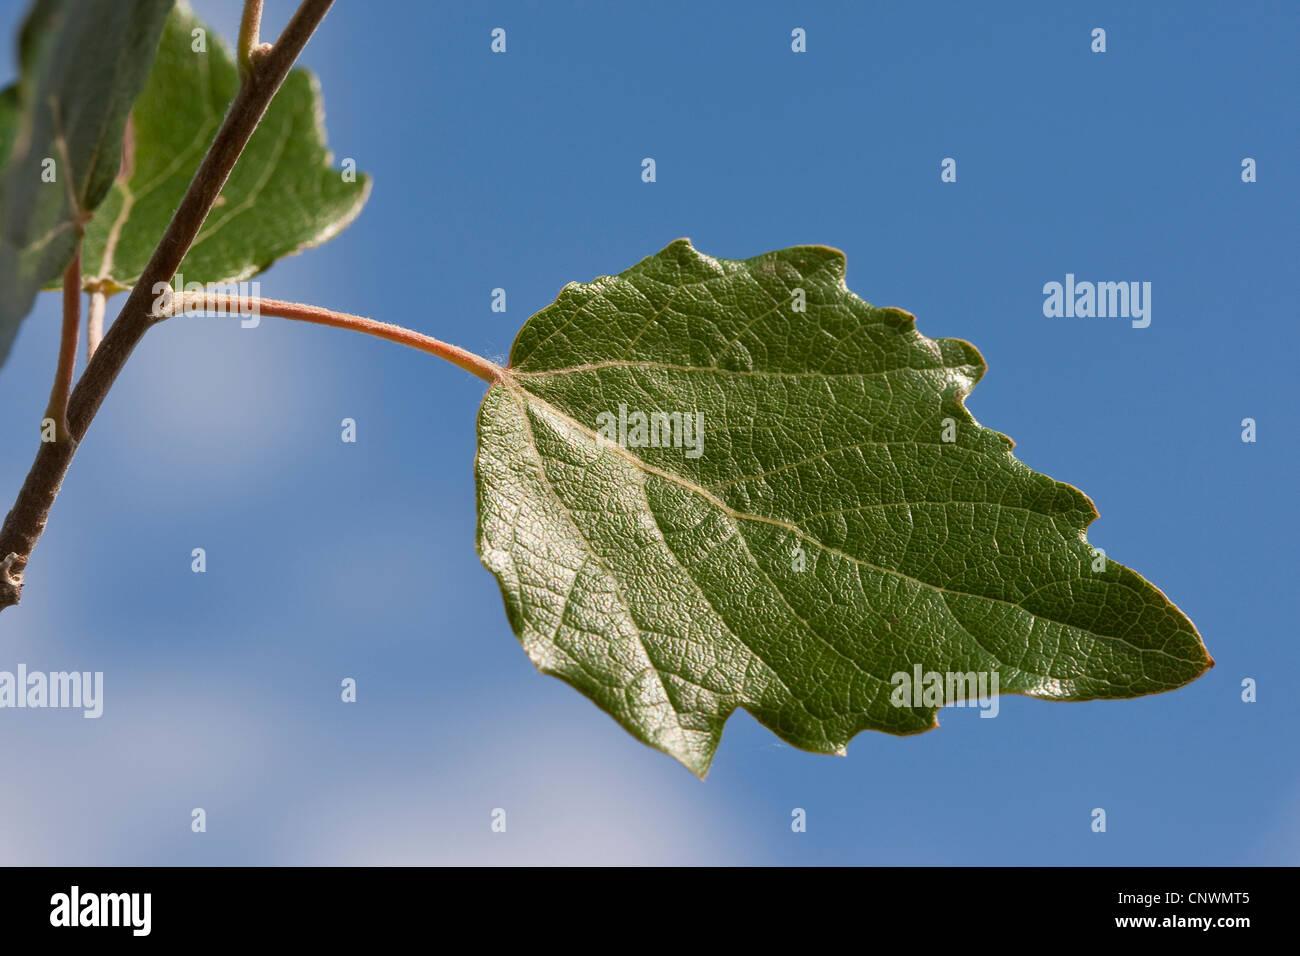 white poplar, silver-leaved poplar, abele (Populus alba), leaf agains blu sky, Germany Stock Photo